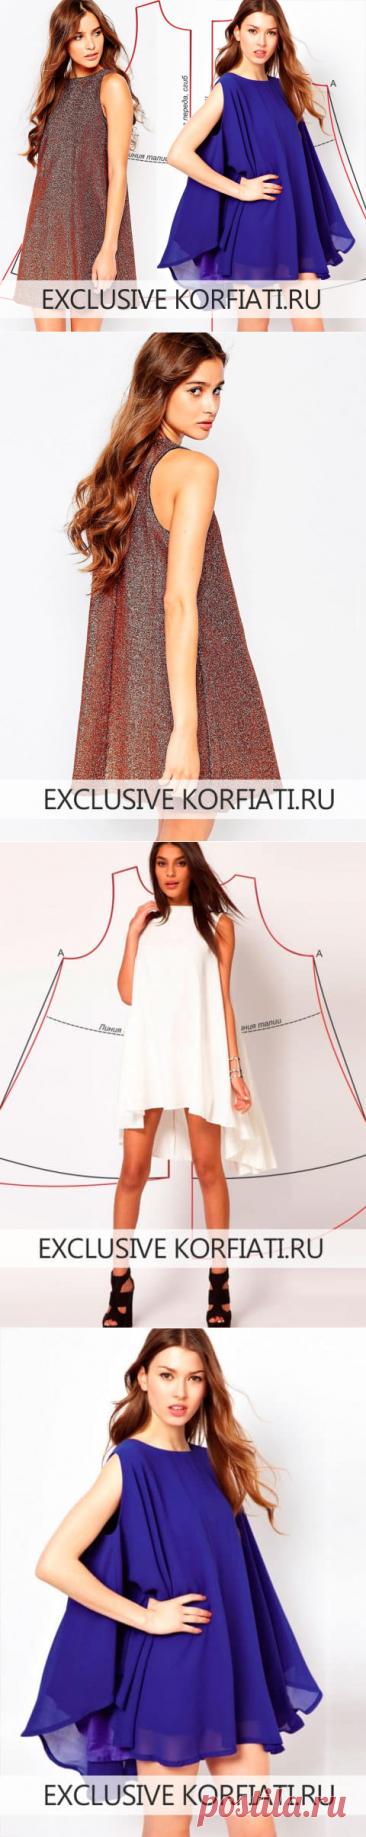 Pattern of a free dress from A. Korfiatya